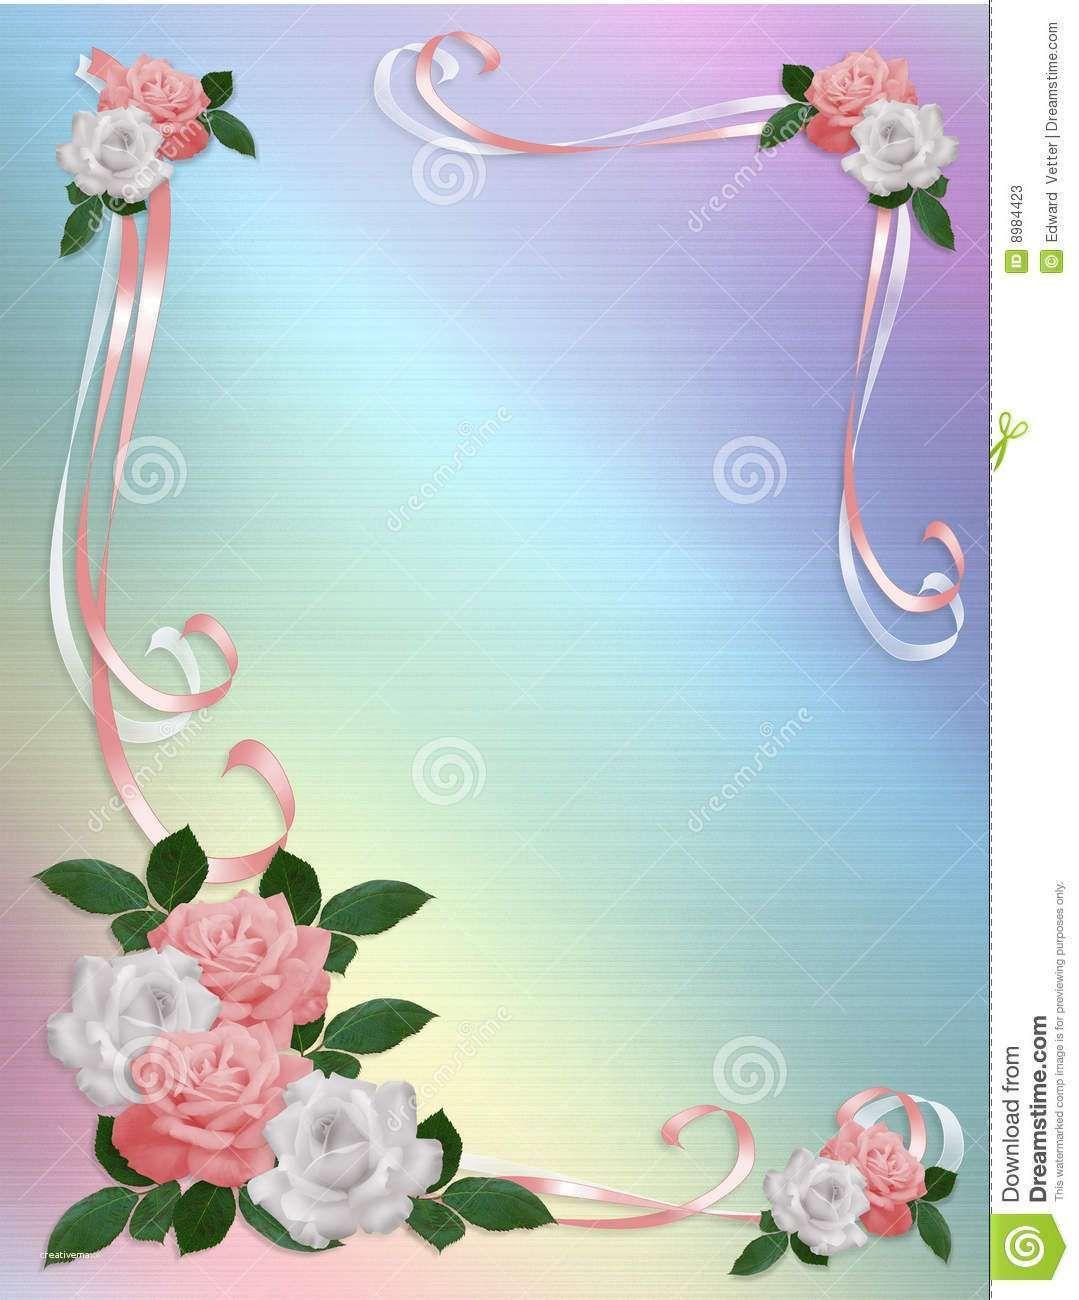 Fresh Wedding Invitation Background Designs Free Download   Creative Maxx  Ideas